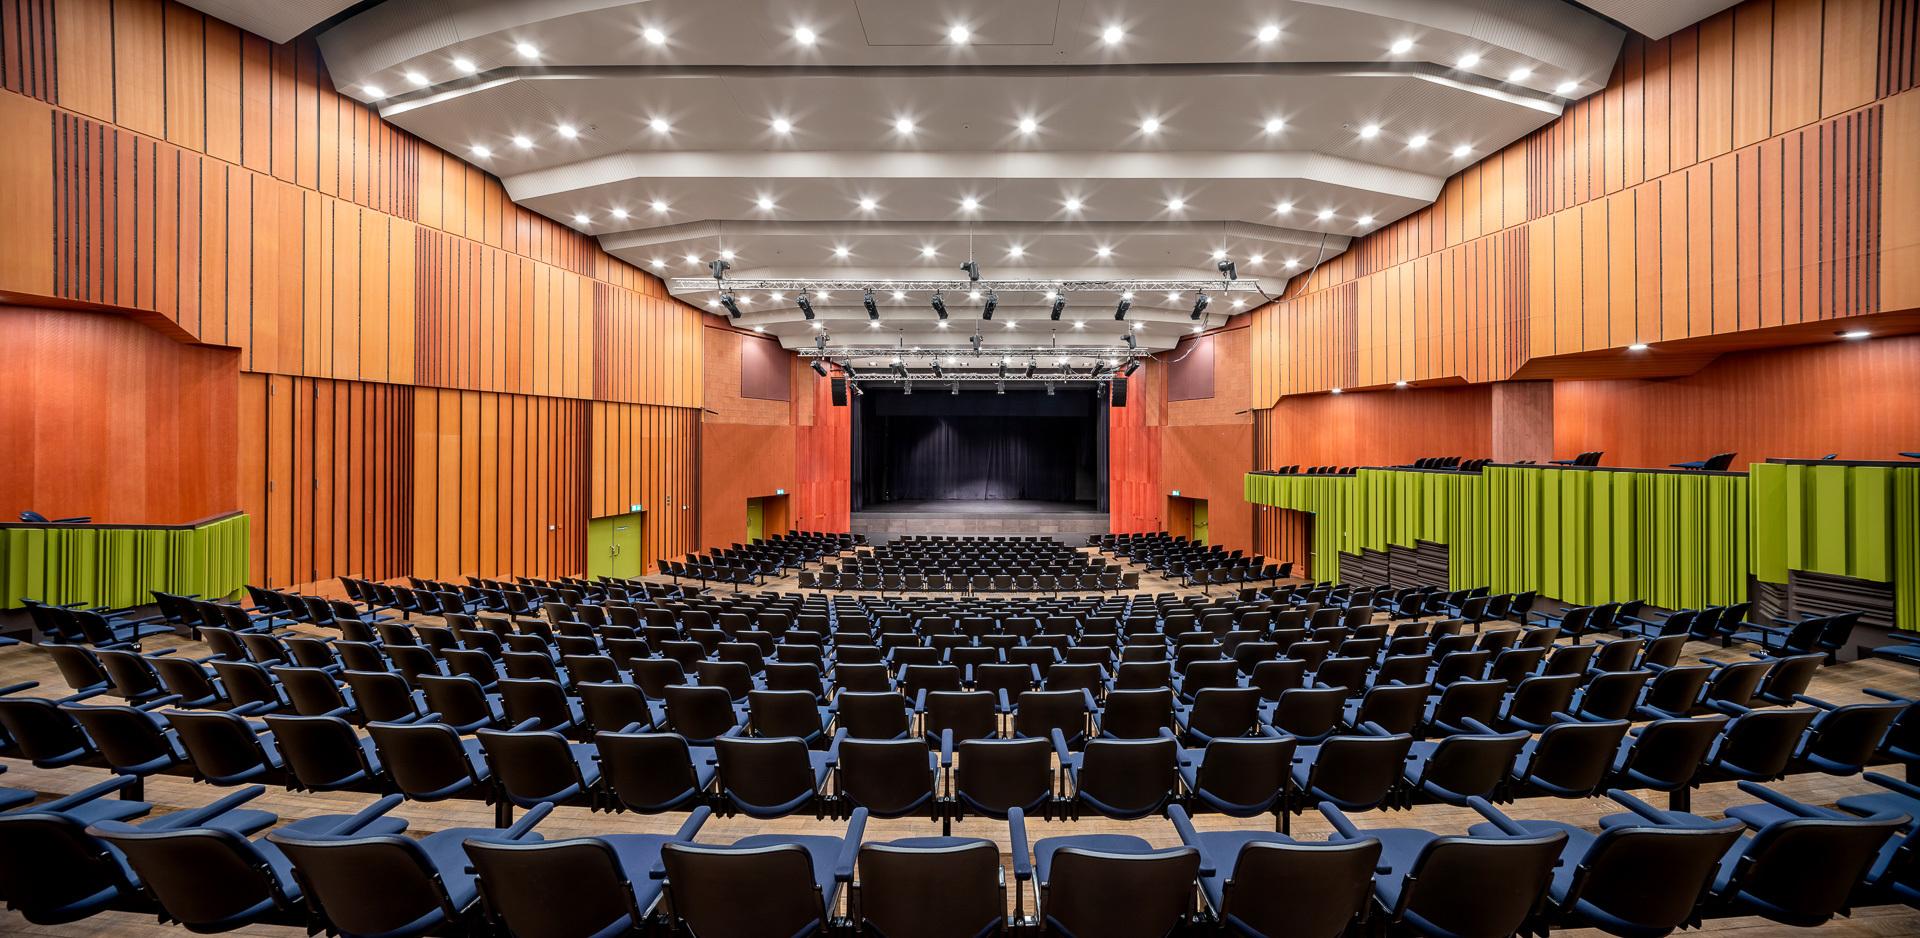 Schadausaal: Auditorium mit 740 Sitzplätzen - Kultur- und Kongresszentrum Thun